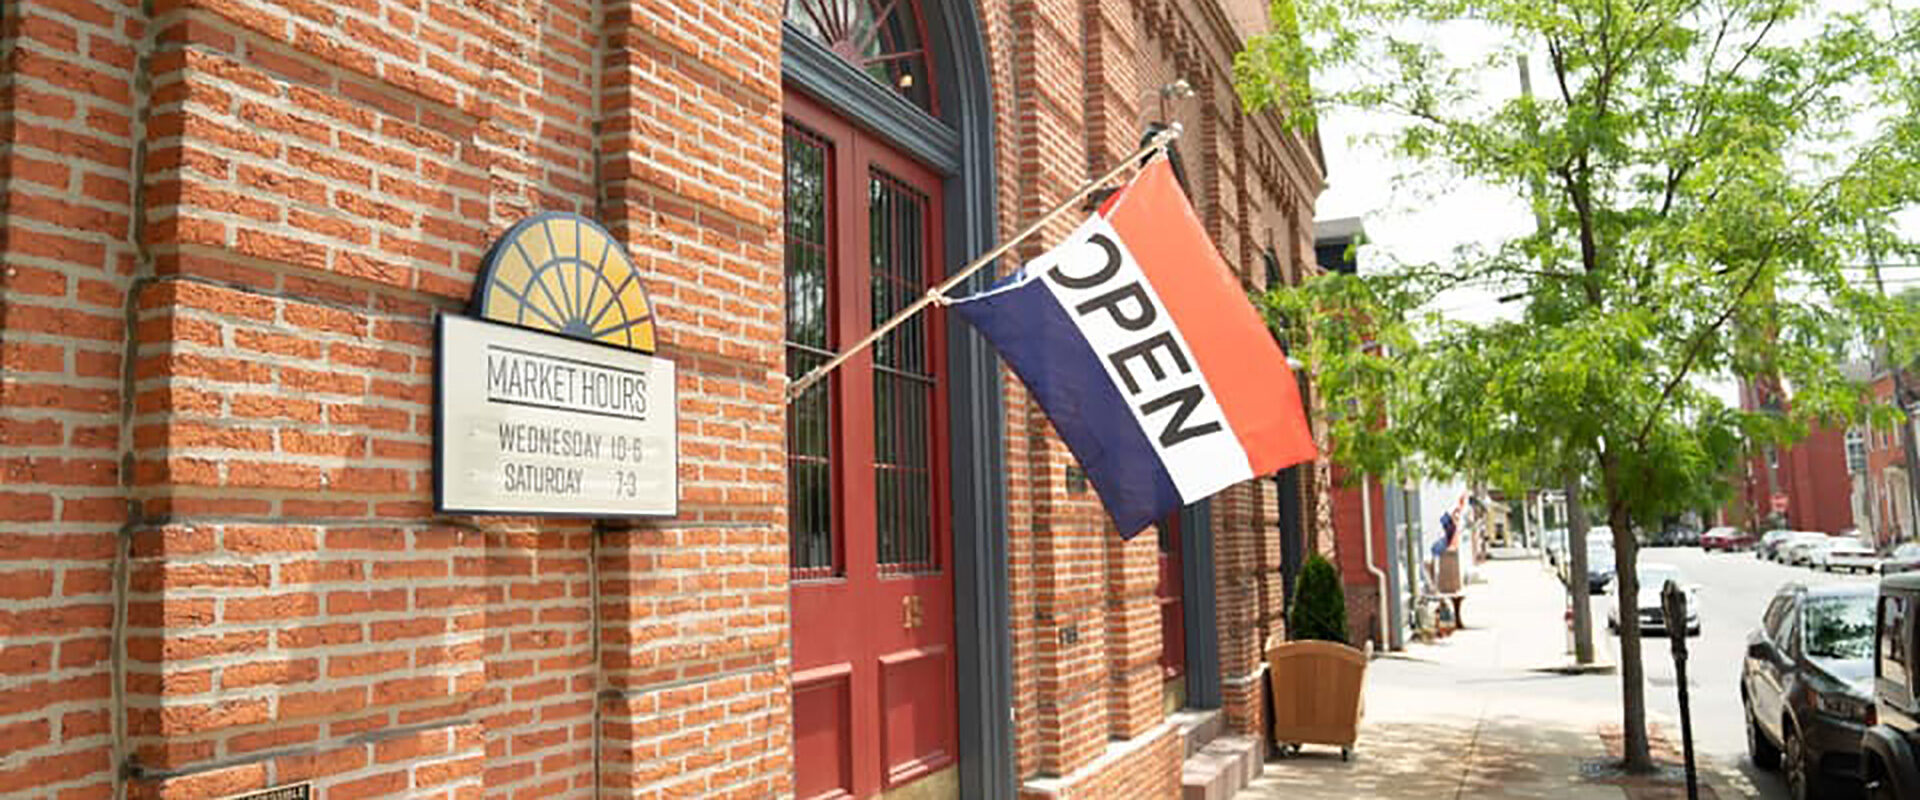 Market House Open